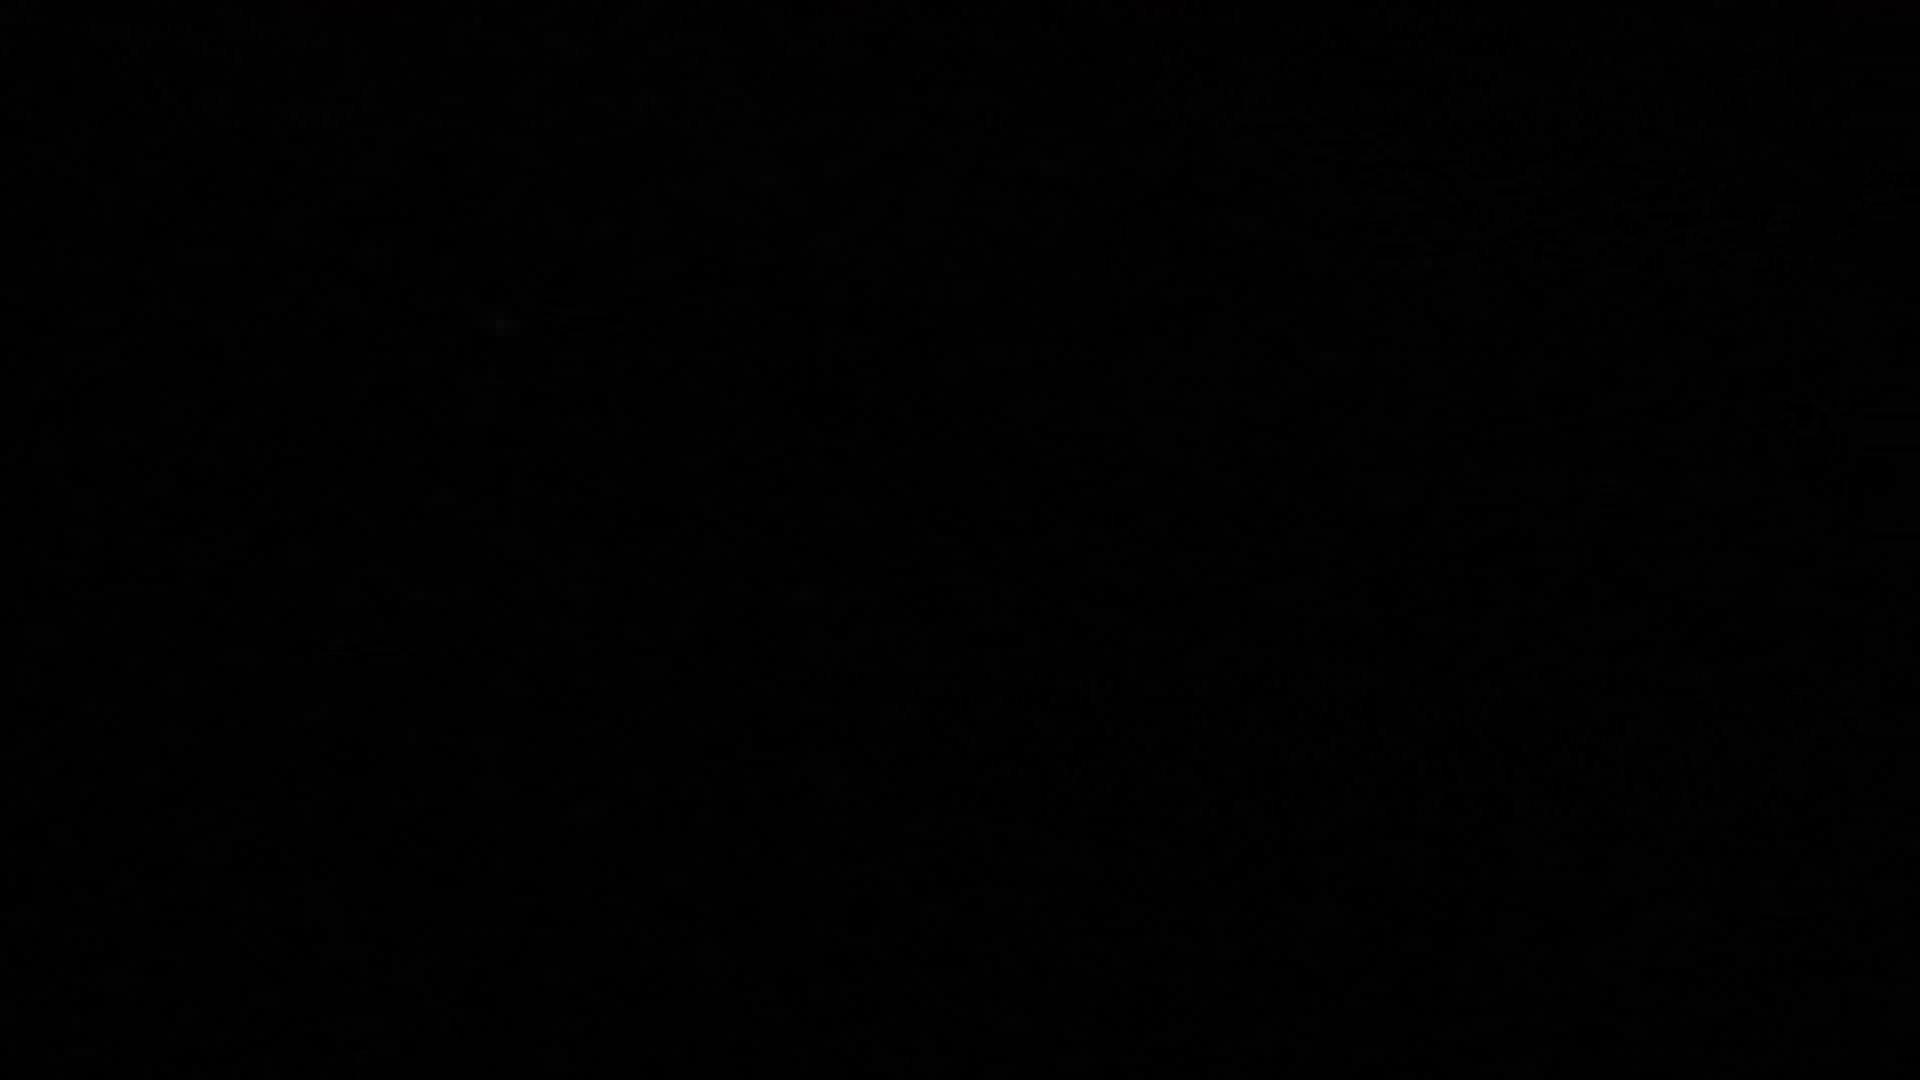 SPYさん初投稿!マンション覗き!5000K!ハイビジョン撮影VOL.05(元サッカー部員社会人) 私服 男同士動画 75連発 49